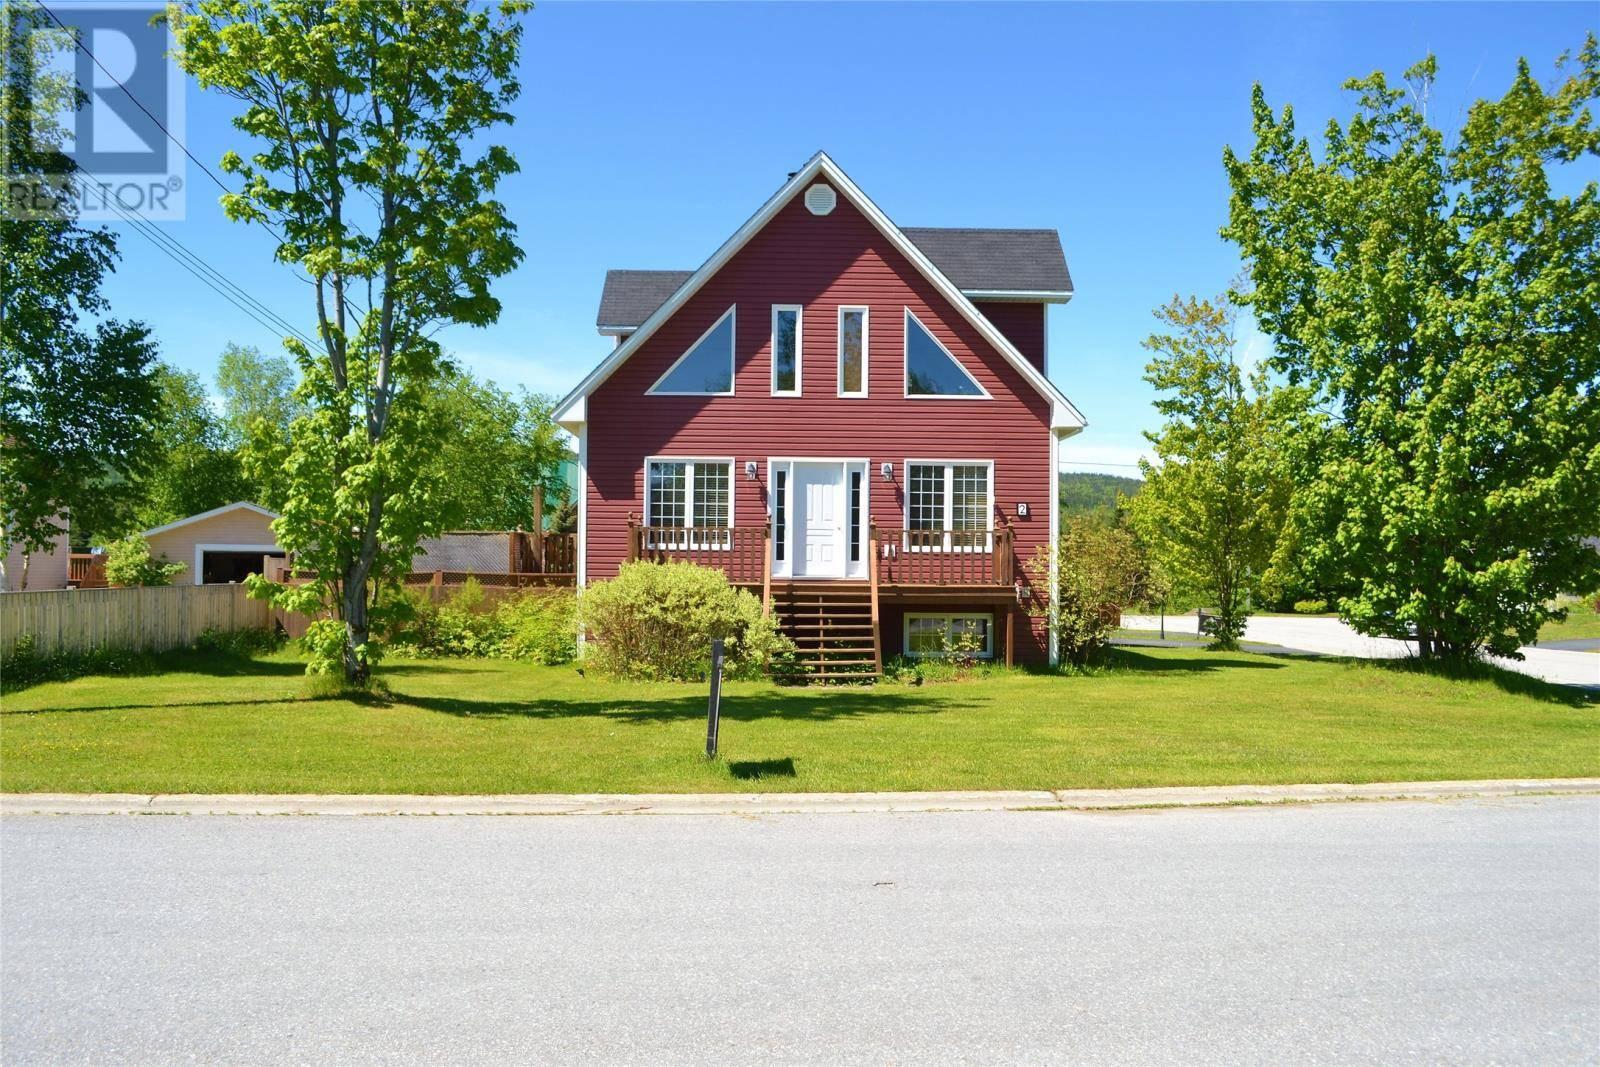 House for sale at 2 King St Pasadena Newfoundland - MLS: 1195749